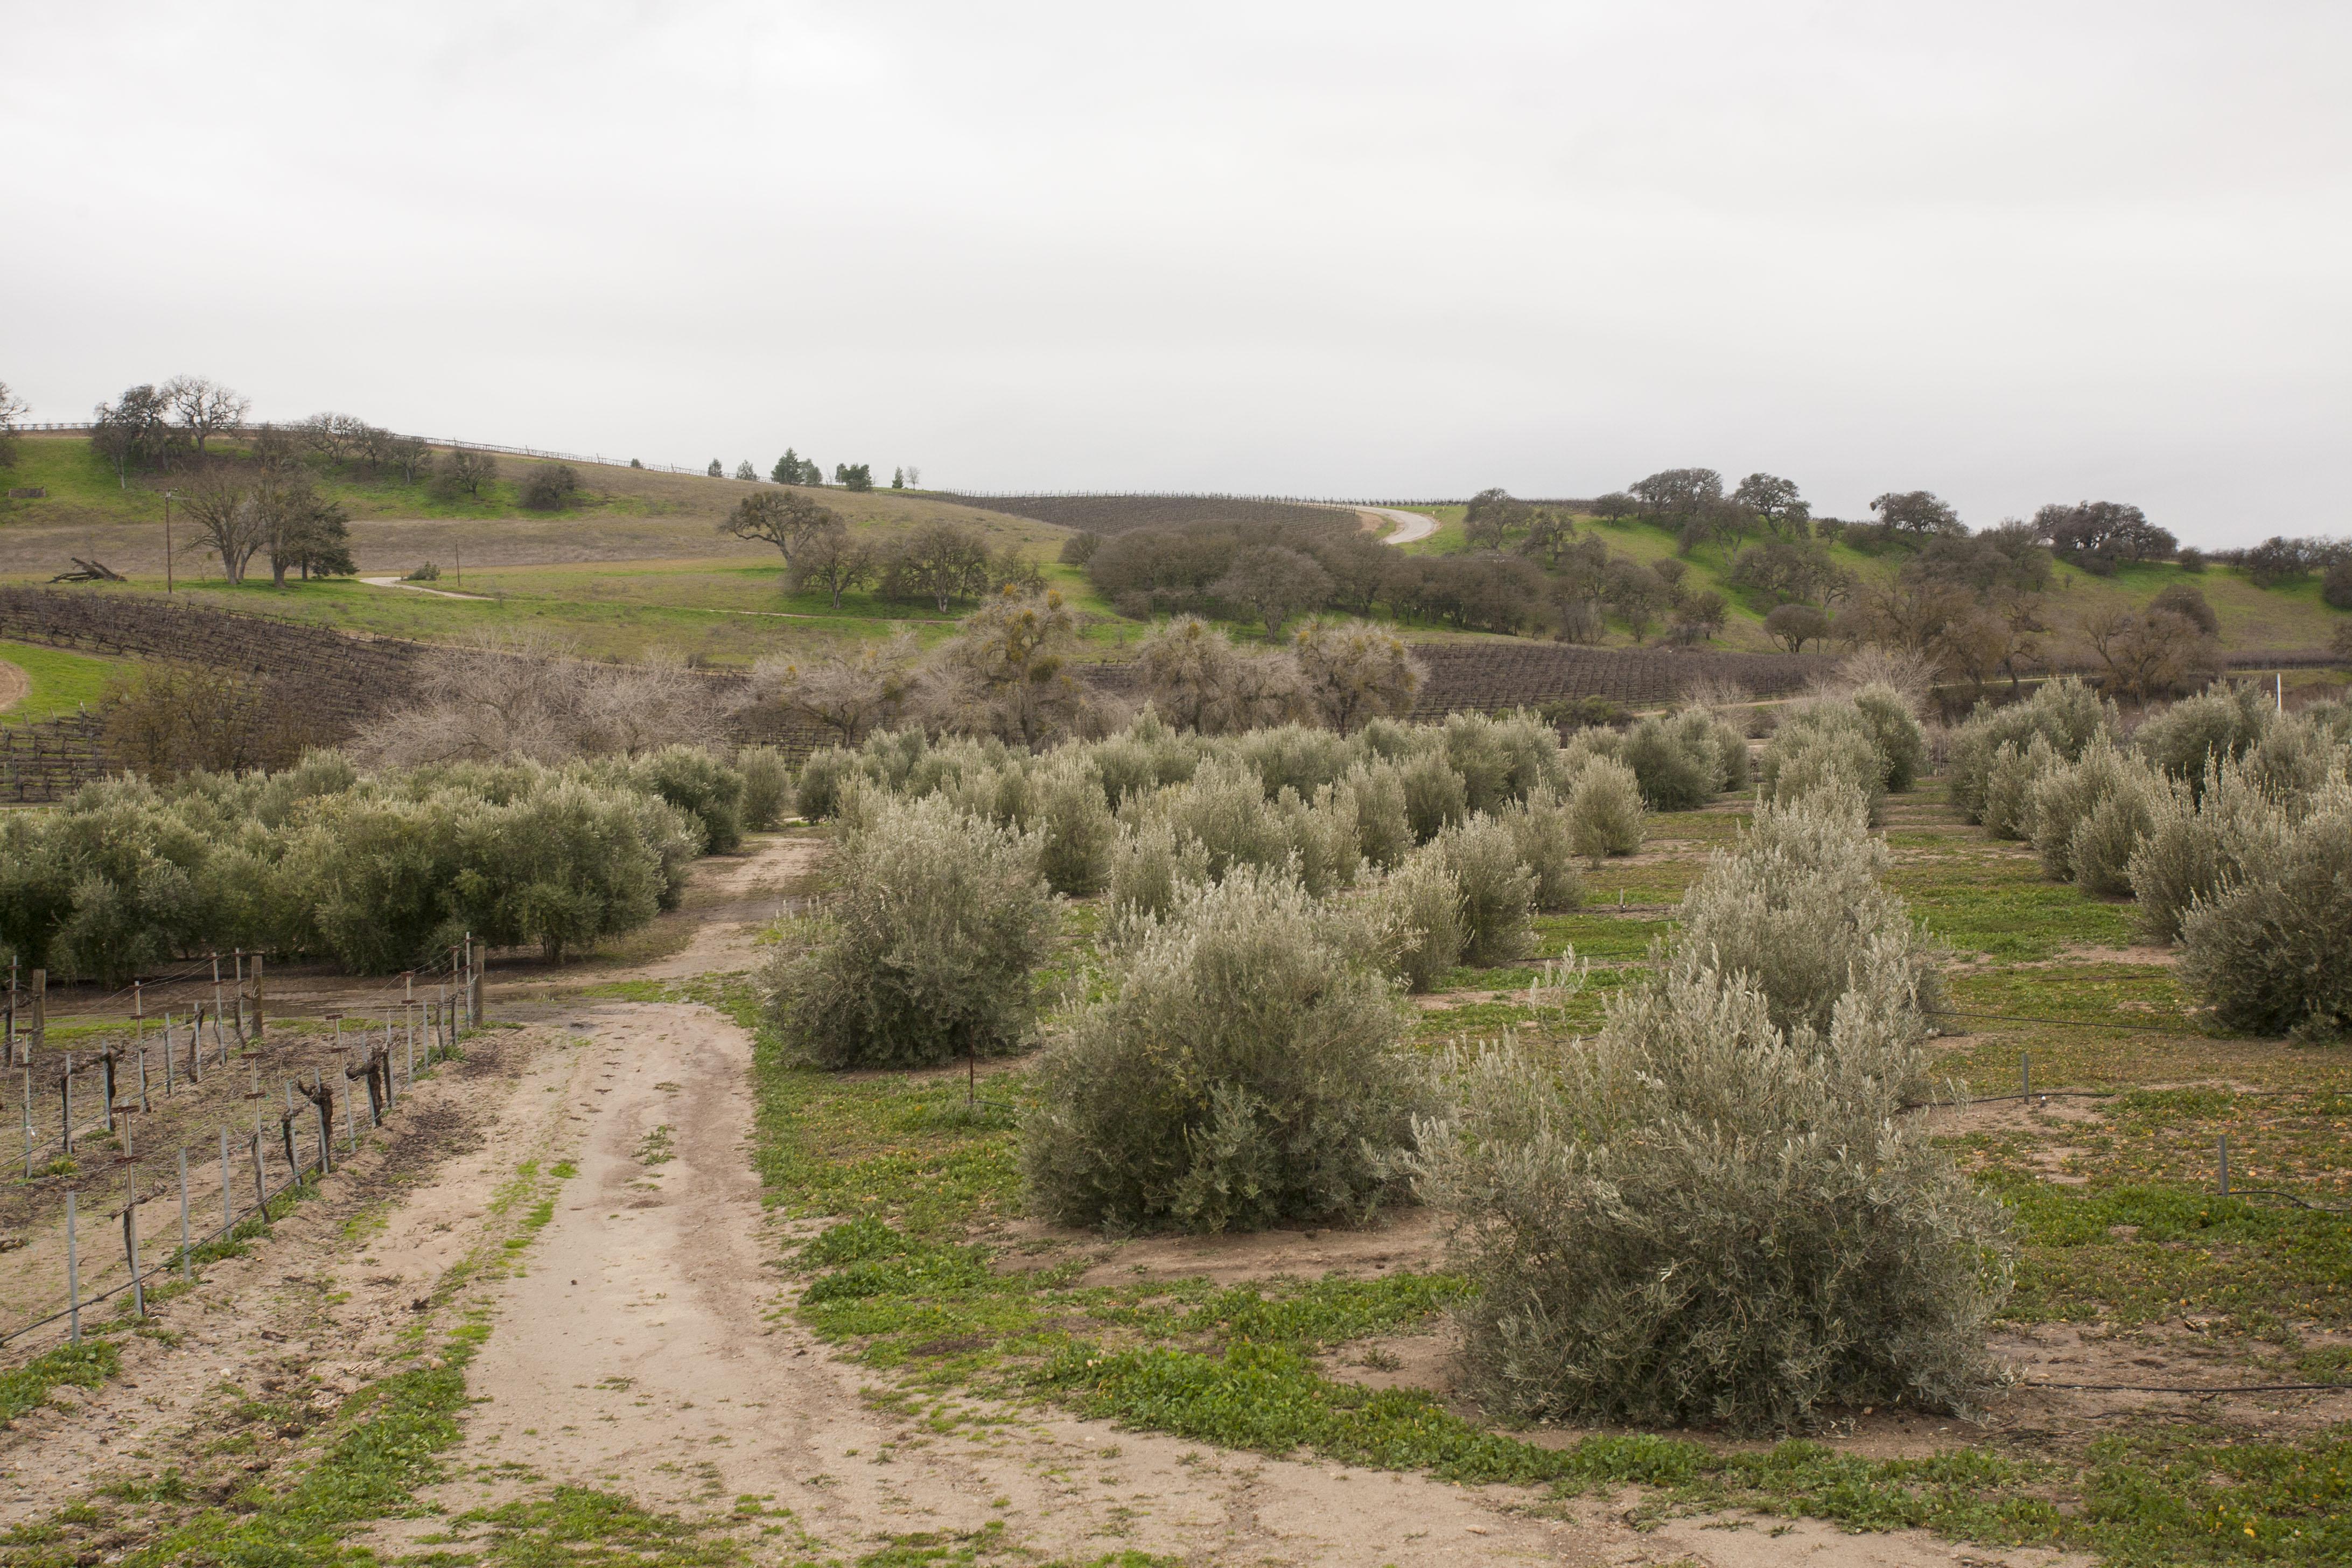 Olive bushes